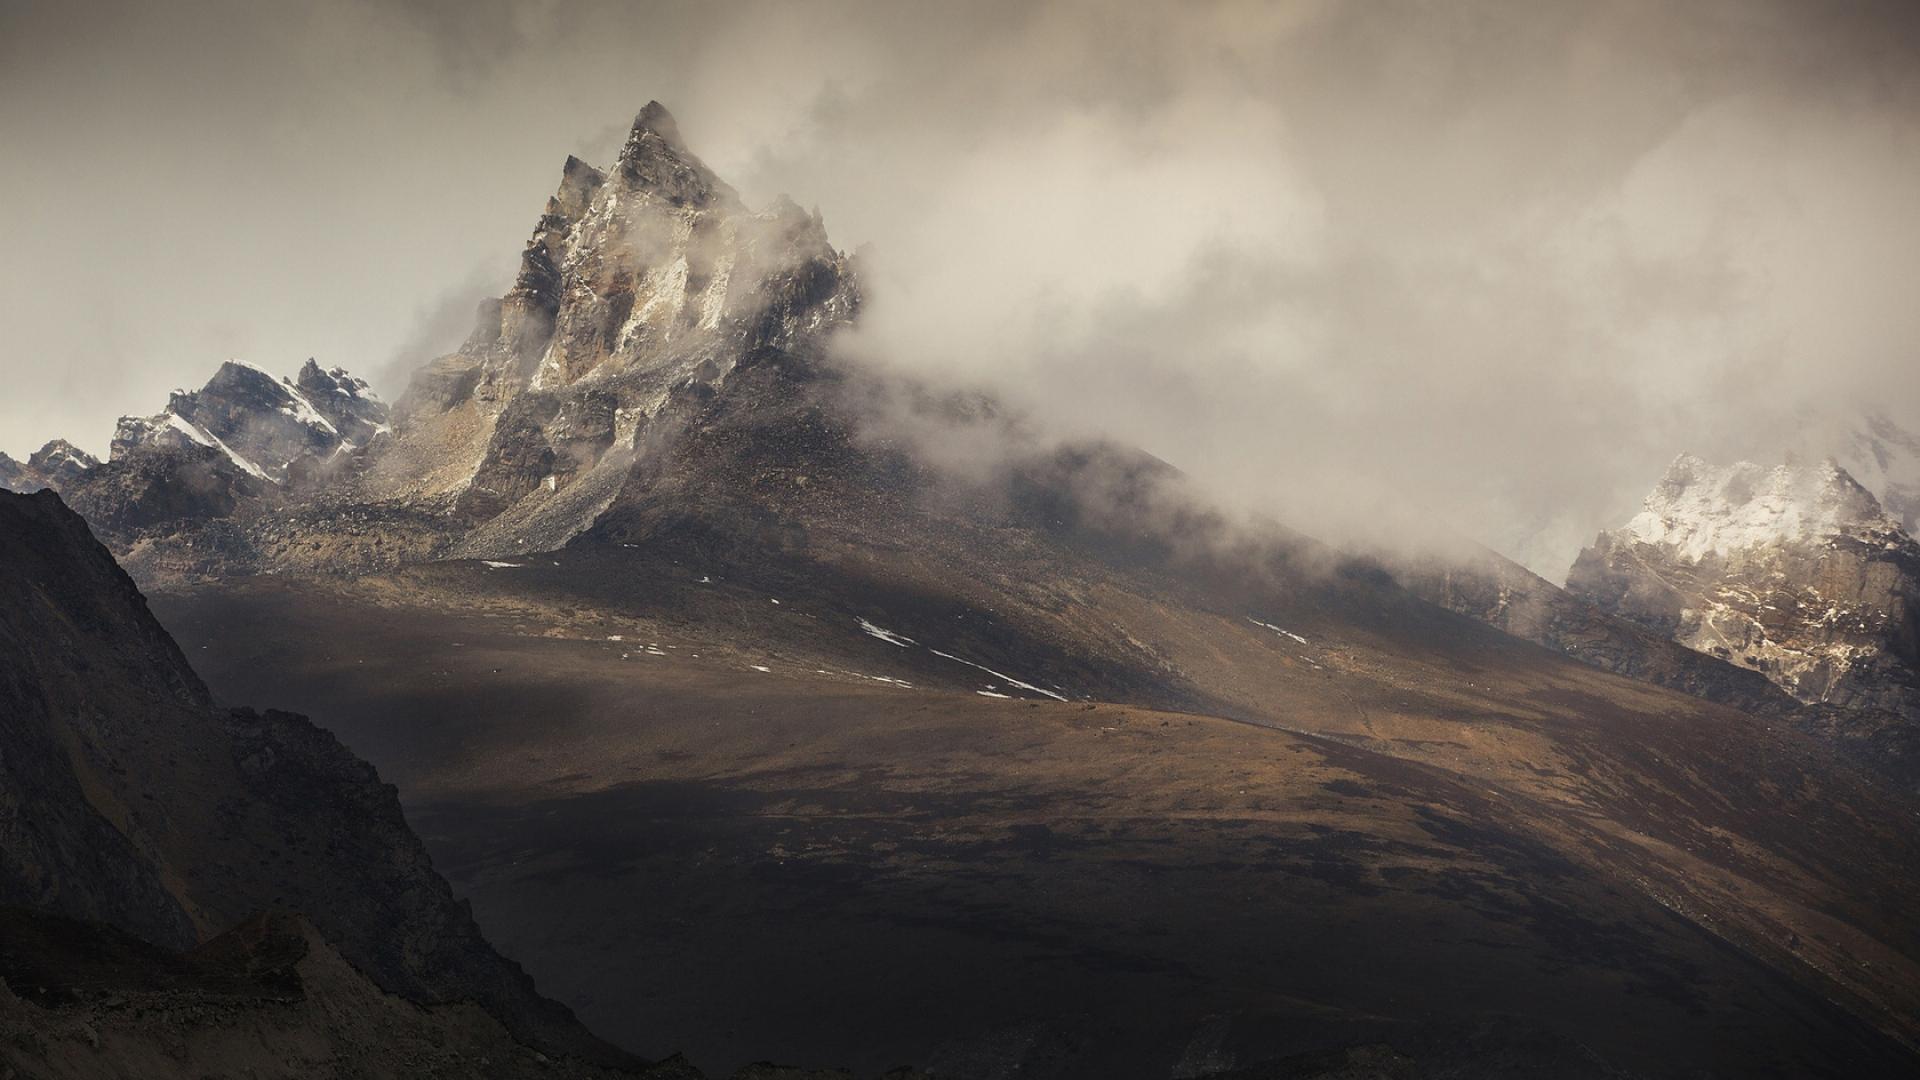 Fantastic Wallpaper Mountain Fog - mountain_fog_gloom_top_colors_45995_1920x1080  Snapshot_42754.jpg